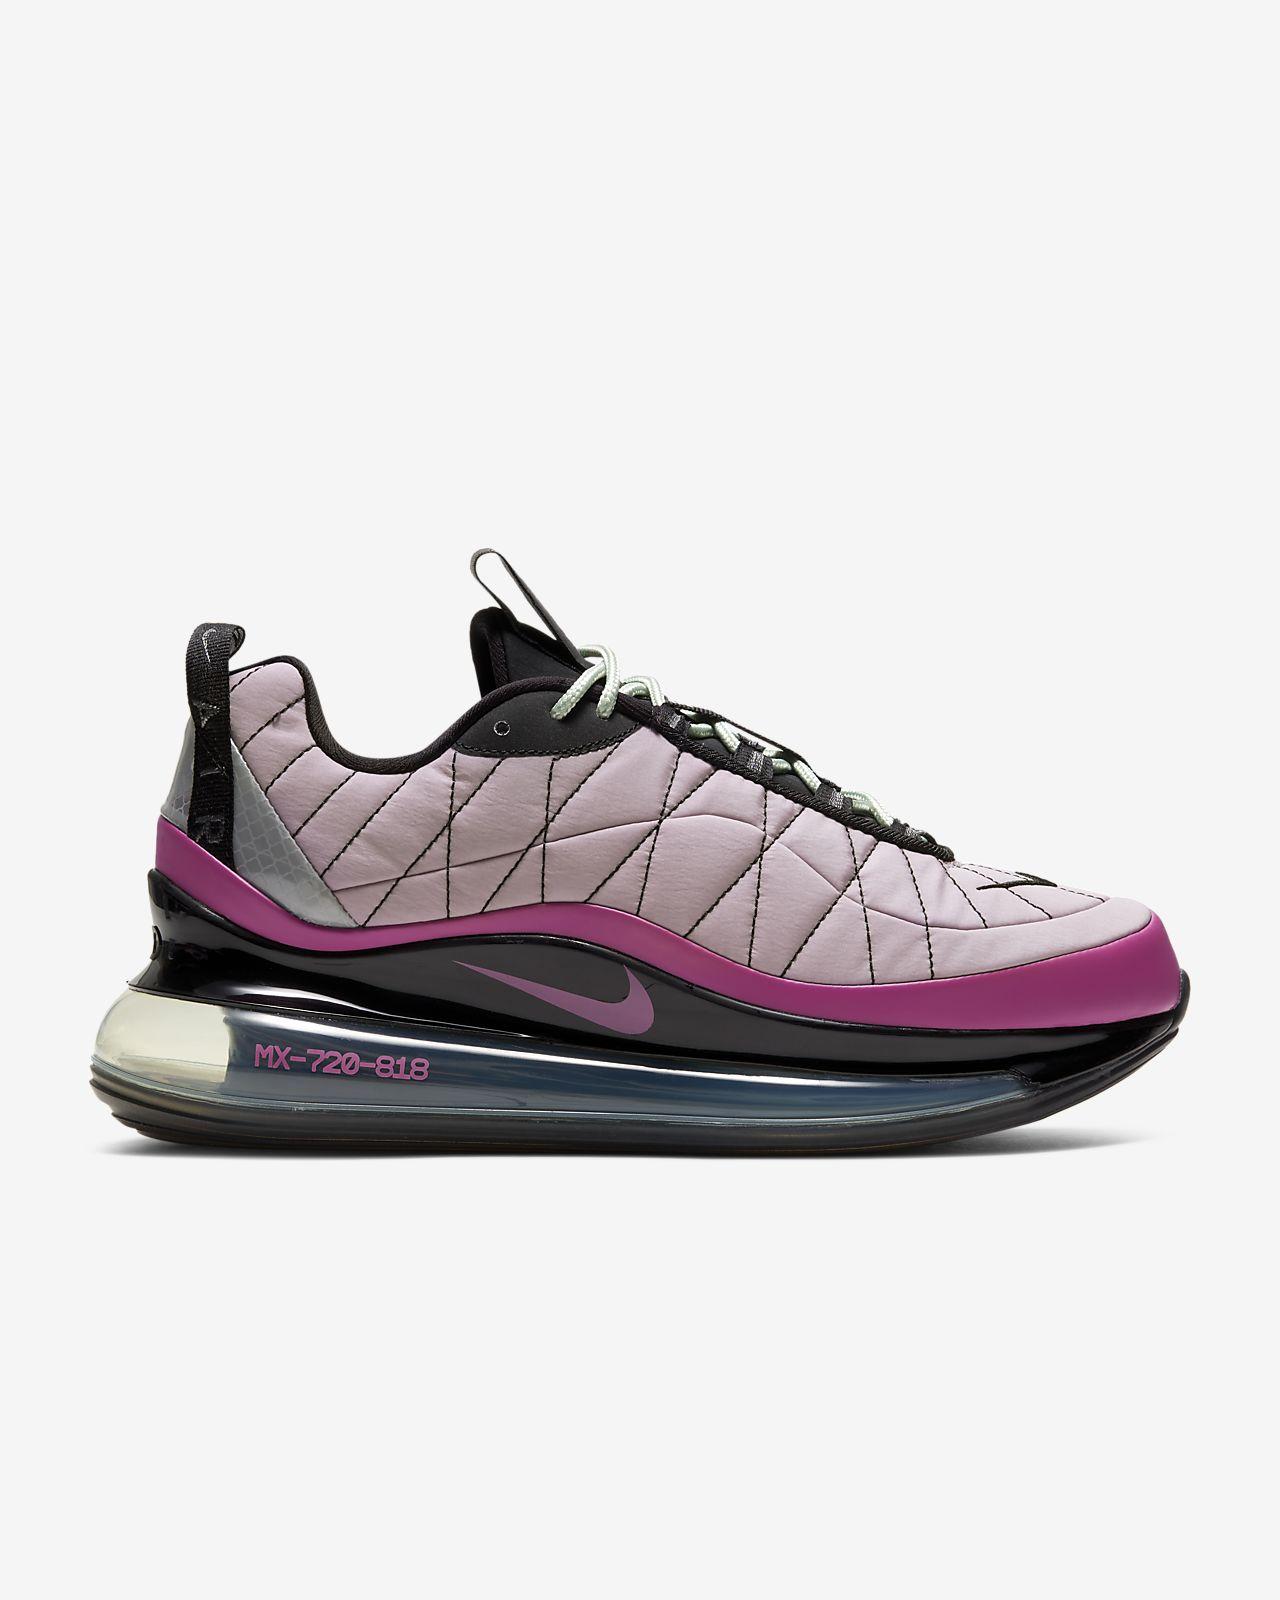 Nike W Mx 720 818 Iced Lilac Cosmic Fuchsia Black